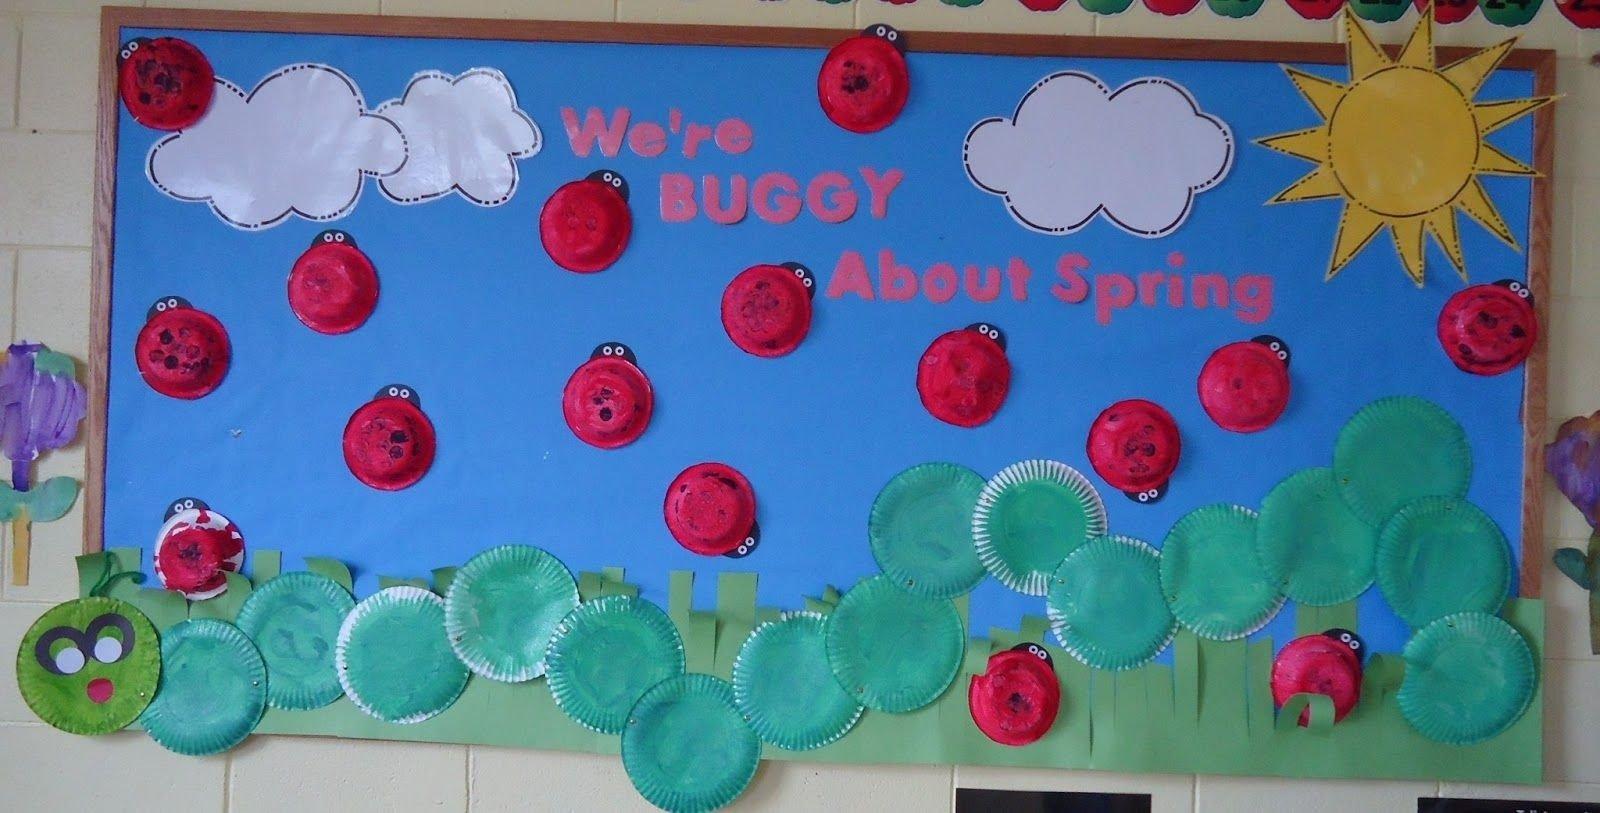 10 Attractive Spring Bulletin Board Ideas Preschool trinity preschool mount prospect were buggy about spring with 1 2021